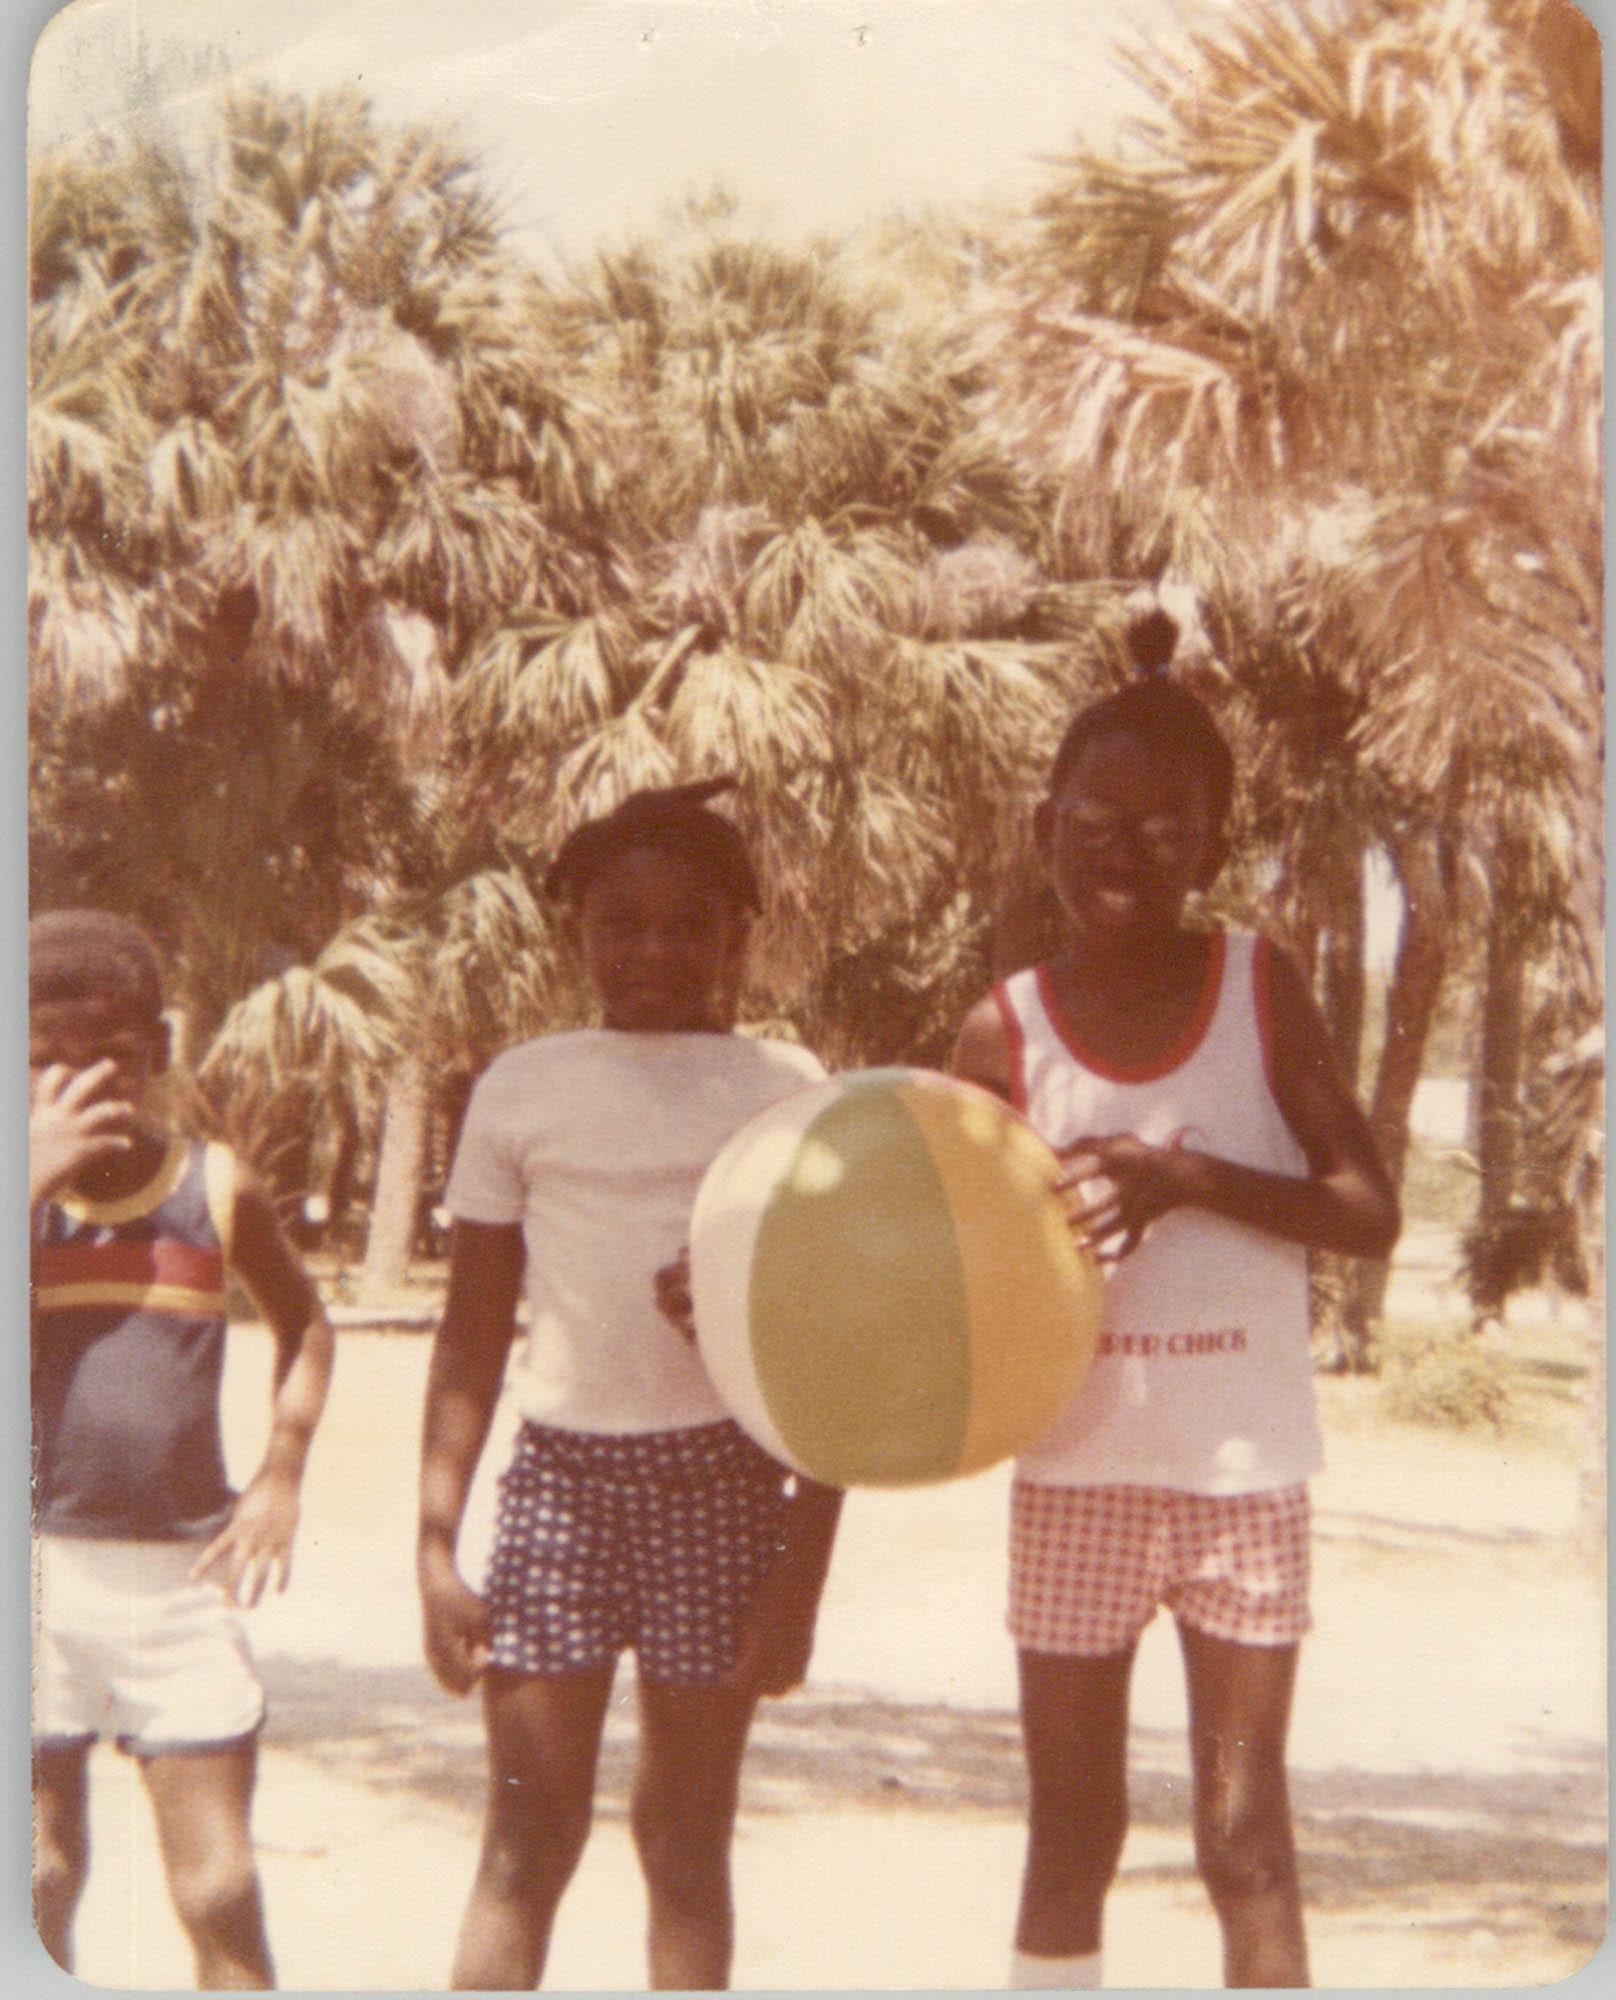 Photograph of Three Children